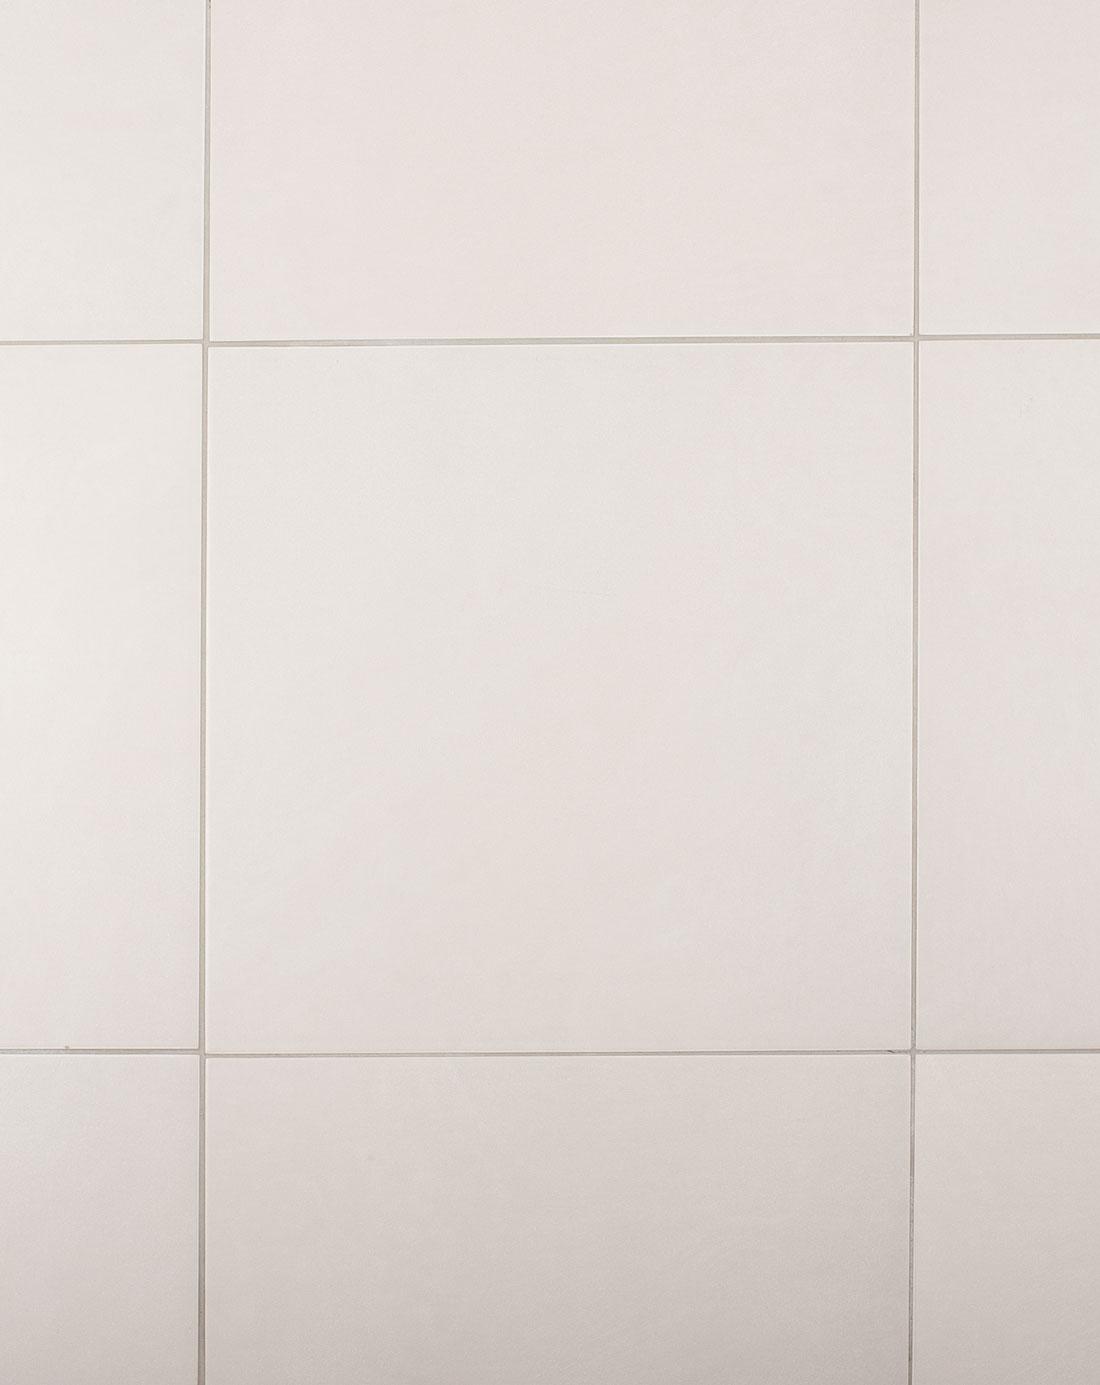 Home Kitchen Floor Tiles Urban Perola Urban Kitchen Floor Tiles